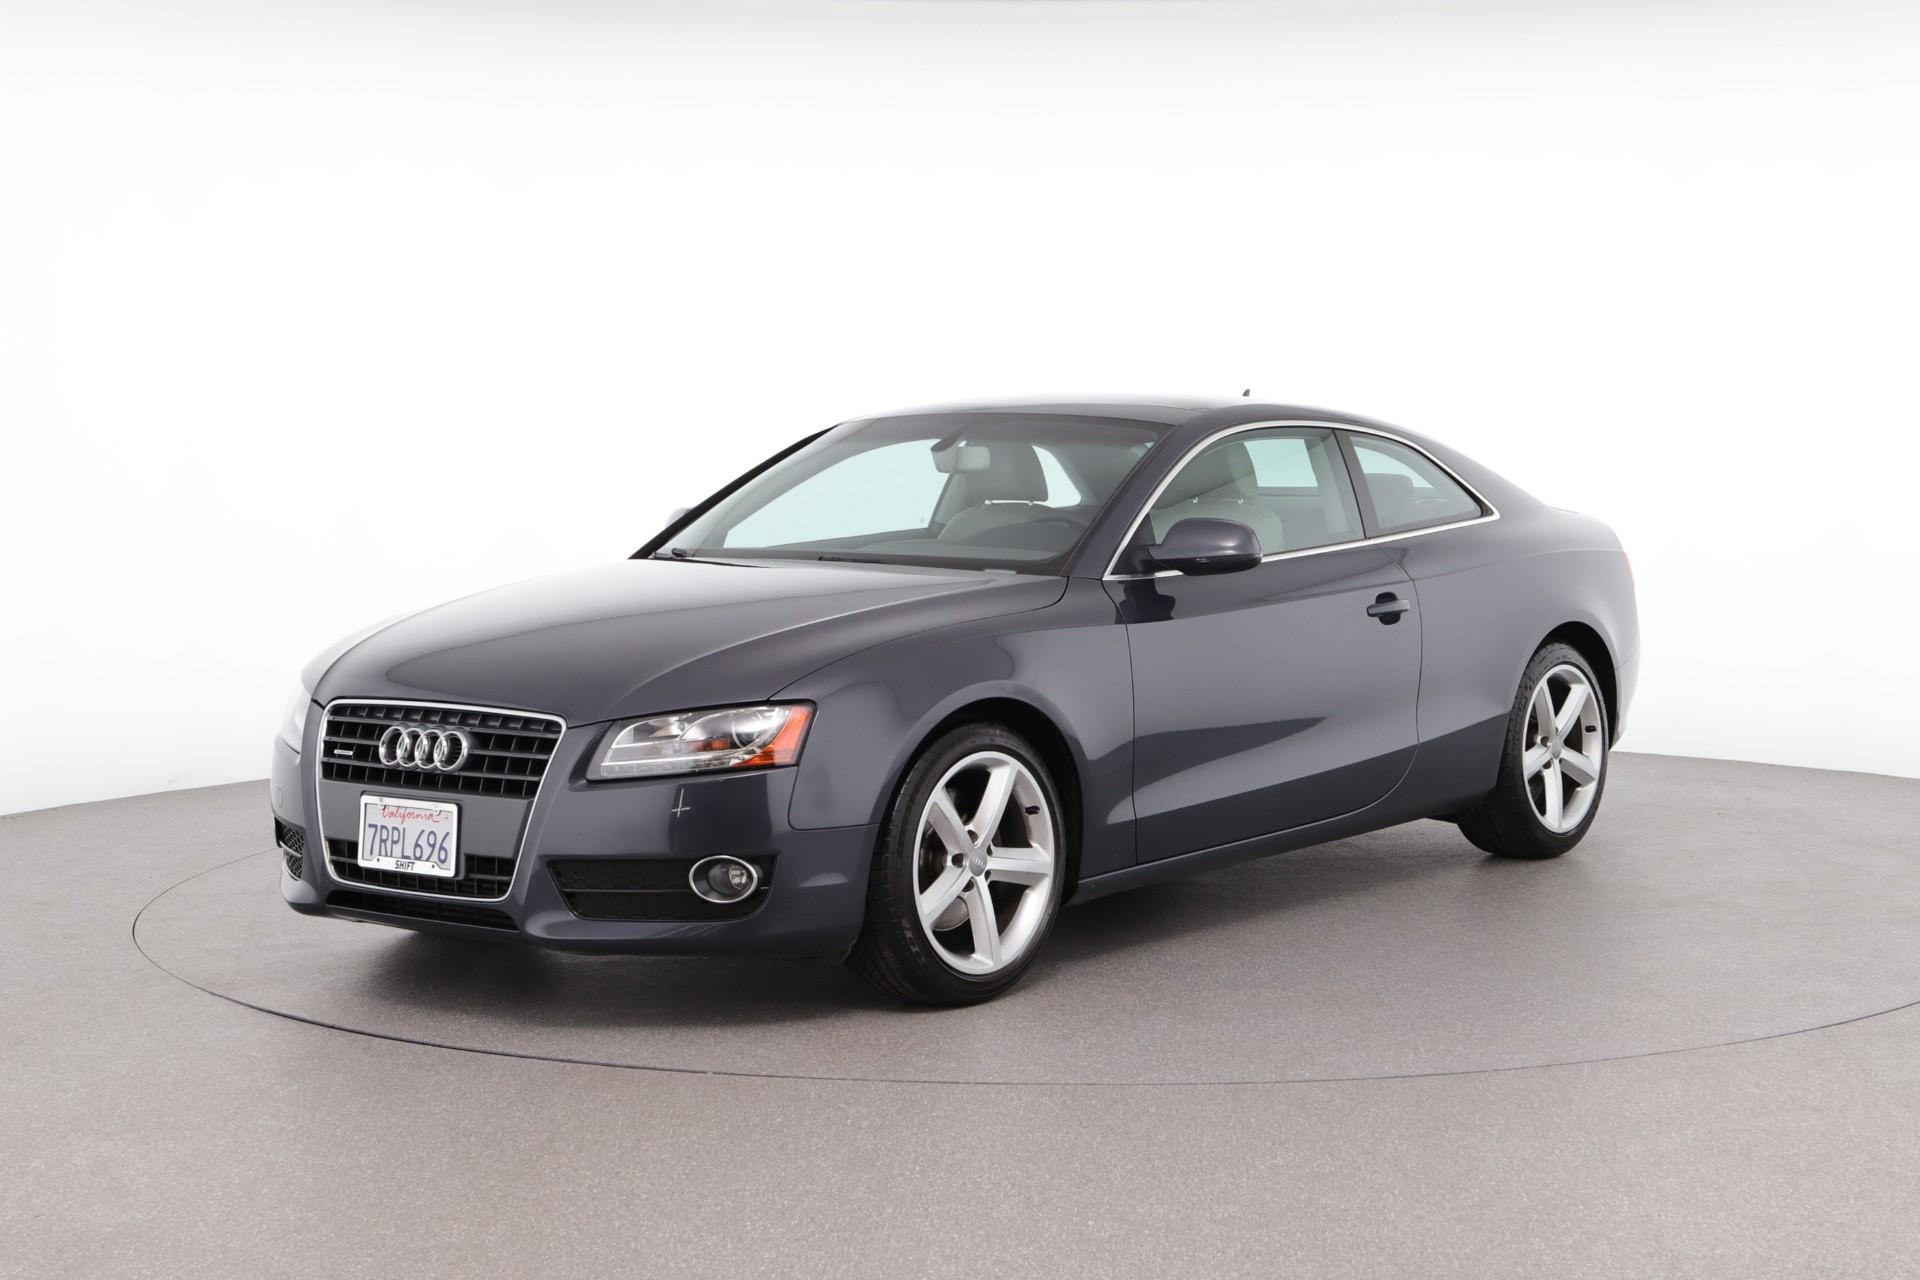 2010 Audi A5 2.0L Premium Plus (from $11,000)